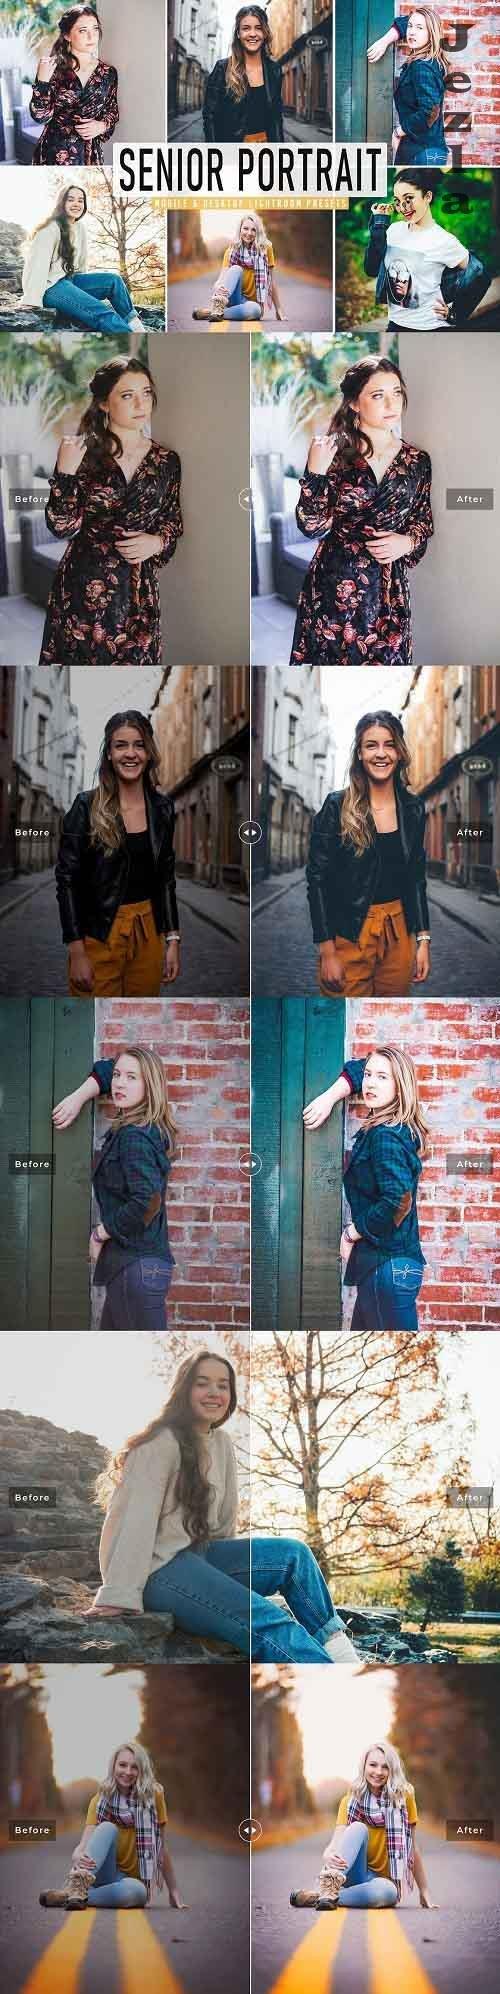 Senior Portrait Pro Lightroom Preset - 5495537 - Mobile & Desktop